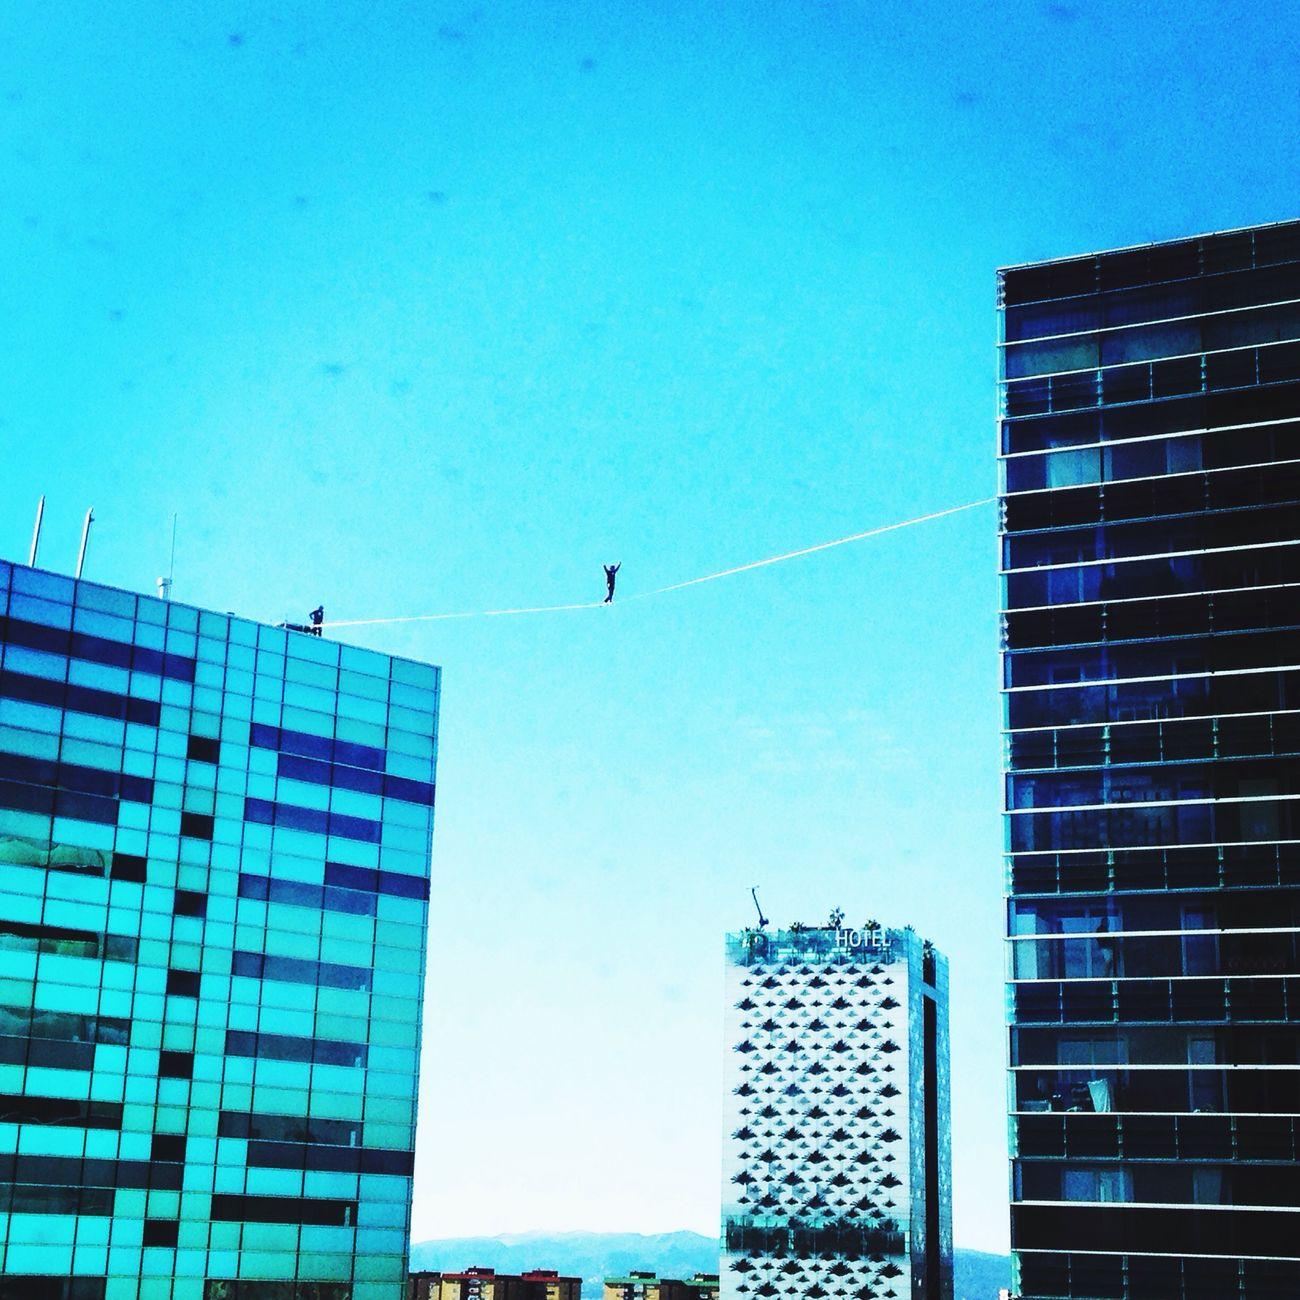 Espectacle des de la feina Enjoying The Sun Funambulist Equilibrio Extreme Altura Barcelona